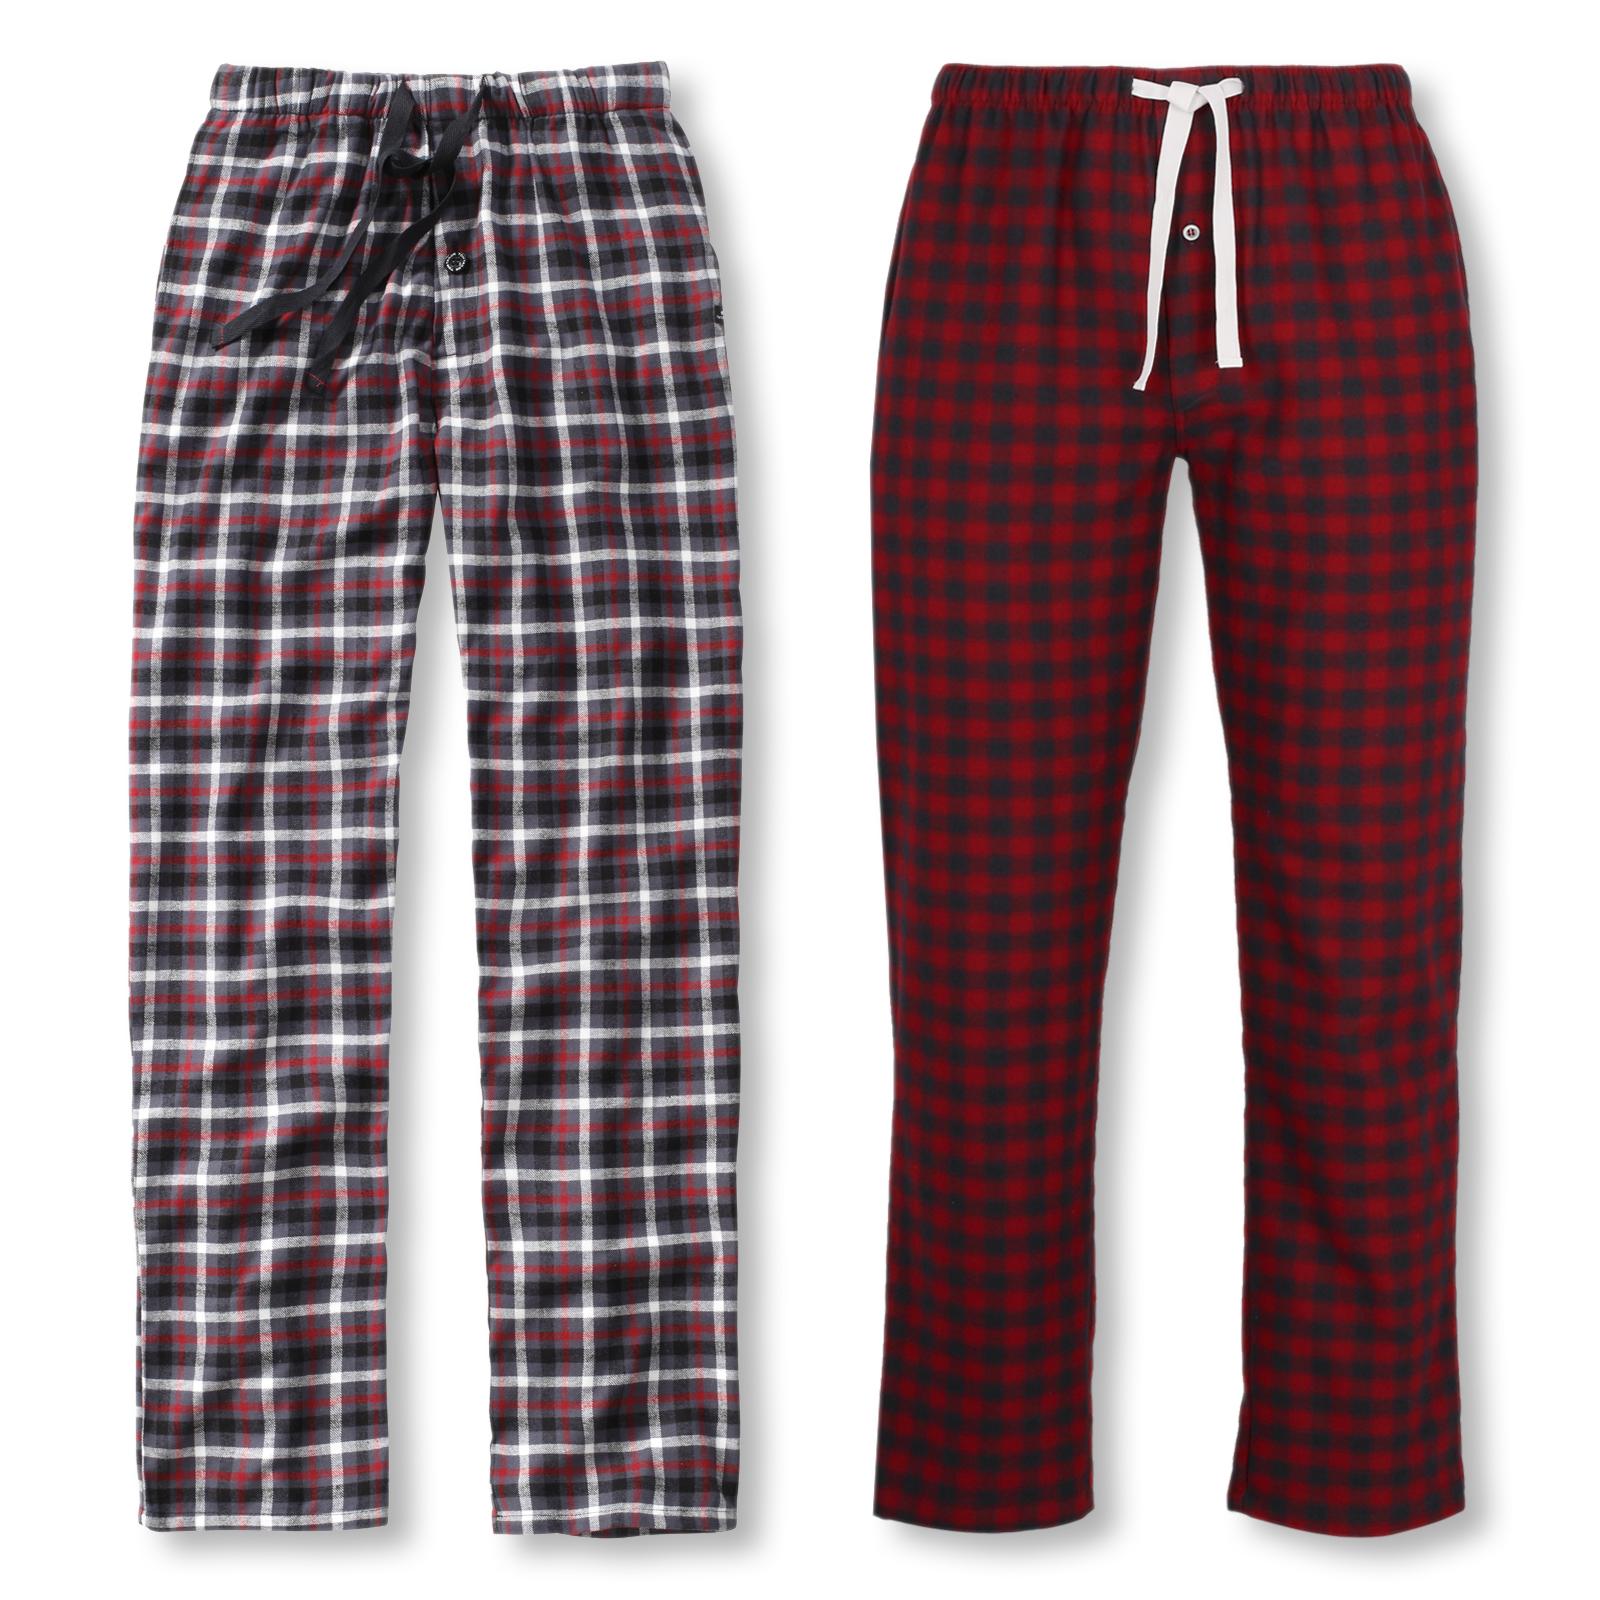 Tom Tailor Herren Flanell-Pyjamahose lang Homewear Schlafanzug Hose in red checked